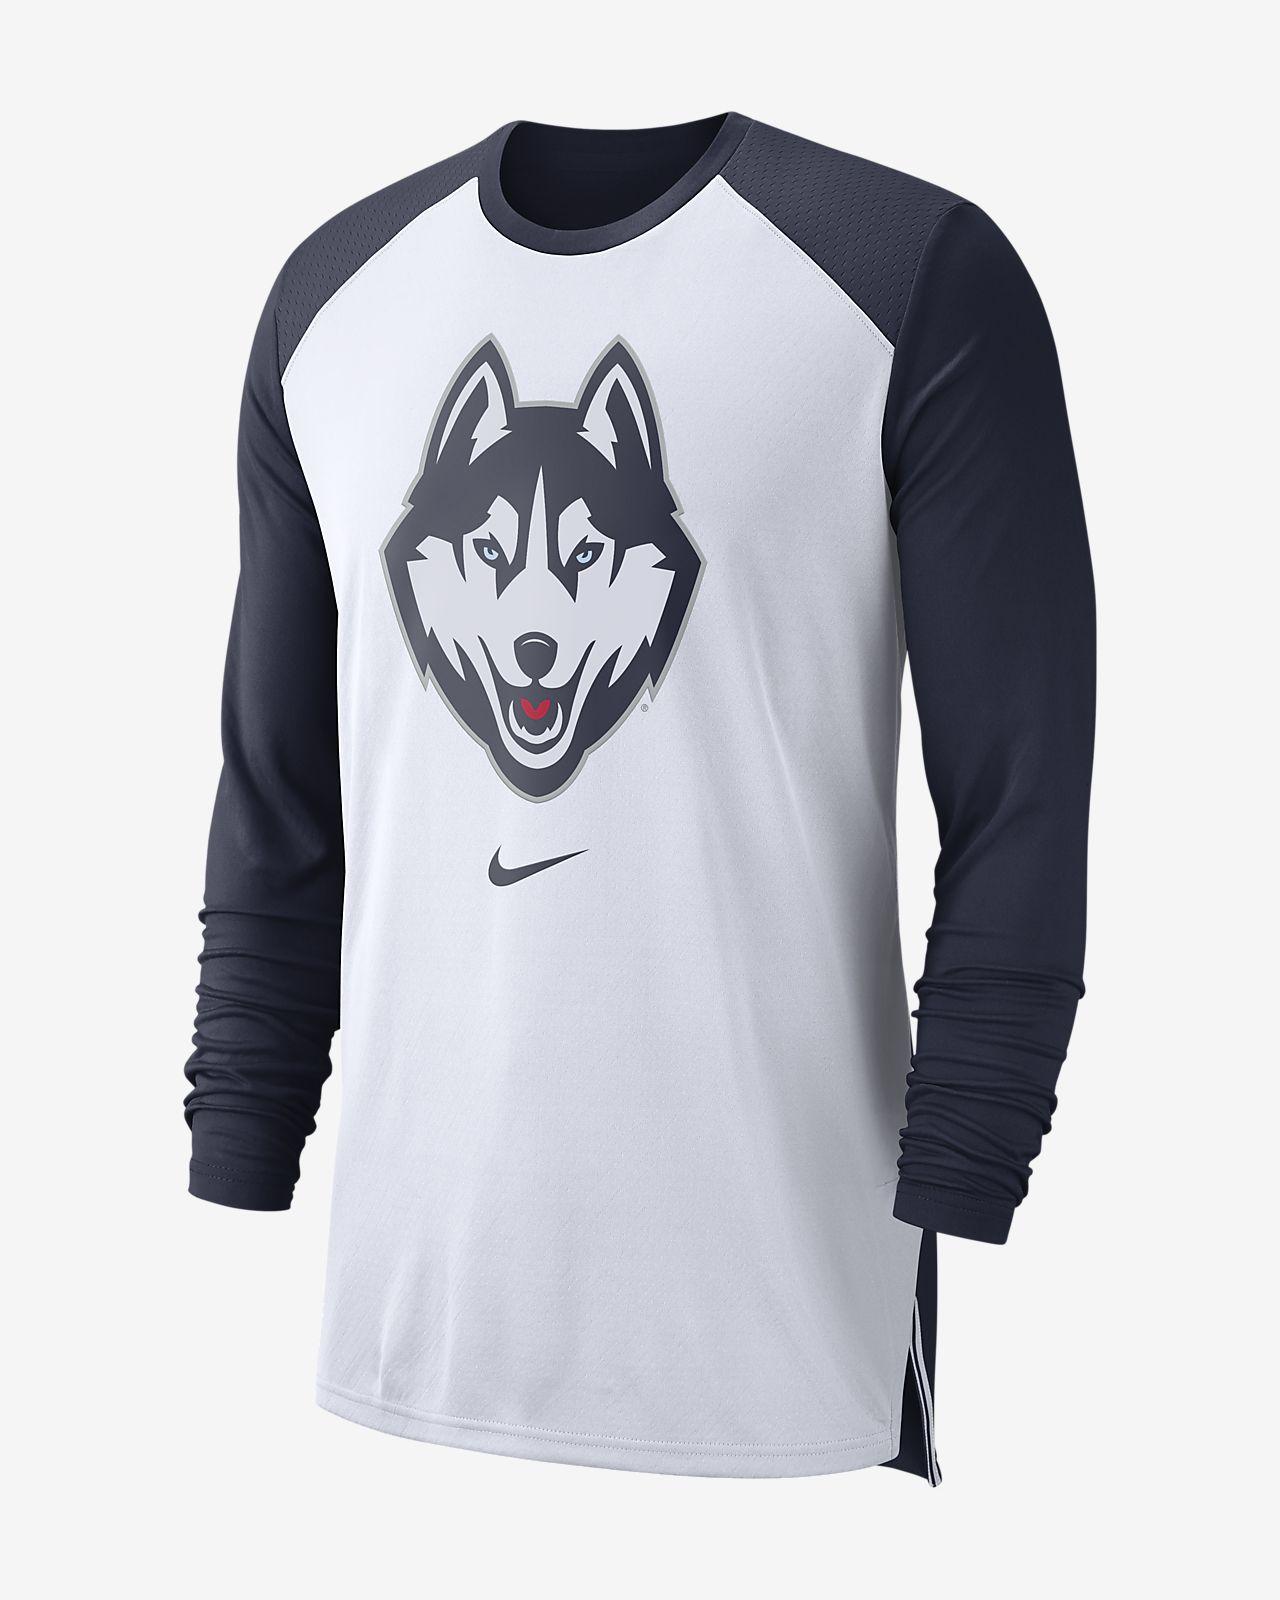 Nike College Breathe (UConn) Men's Long-Sleeve Top